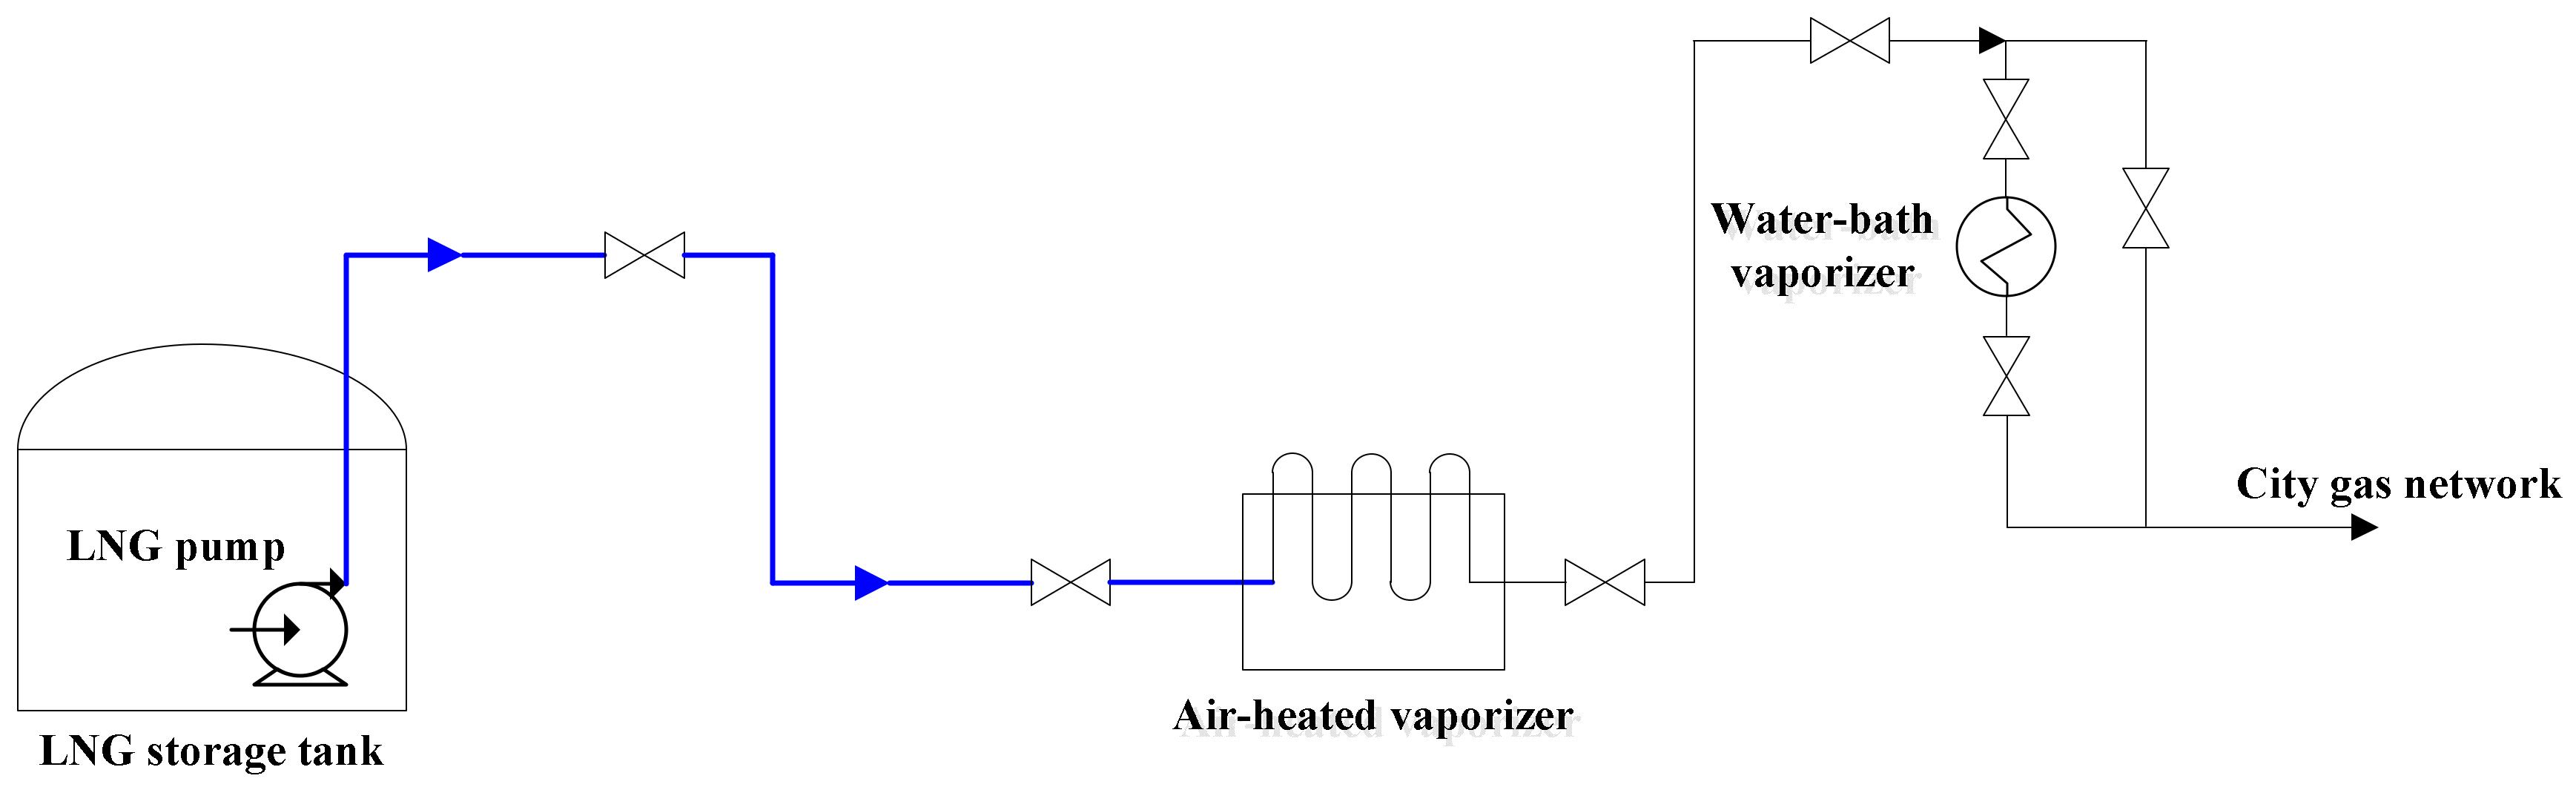 Energies Free Full Text Stress Analysis Of Lng Storage Tank Piping Diagram Ship 11 00877 G002